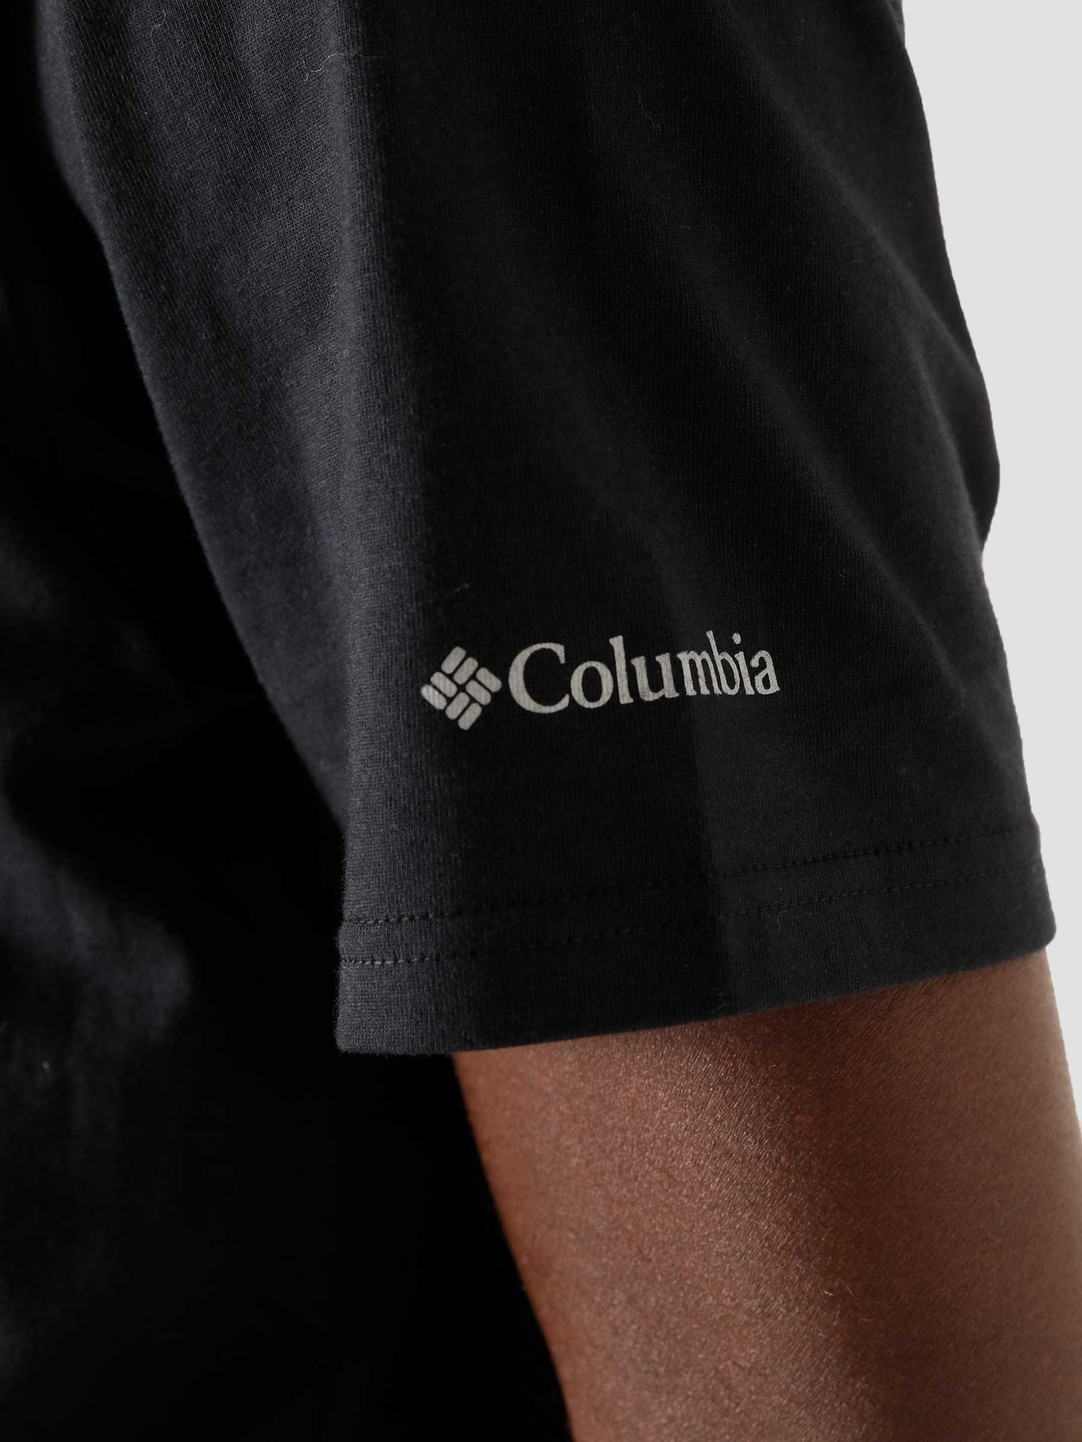 Columbia Basic Logo t-shirt, black, small